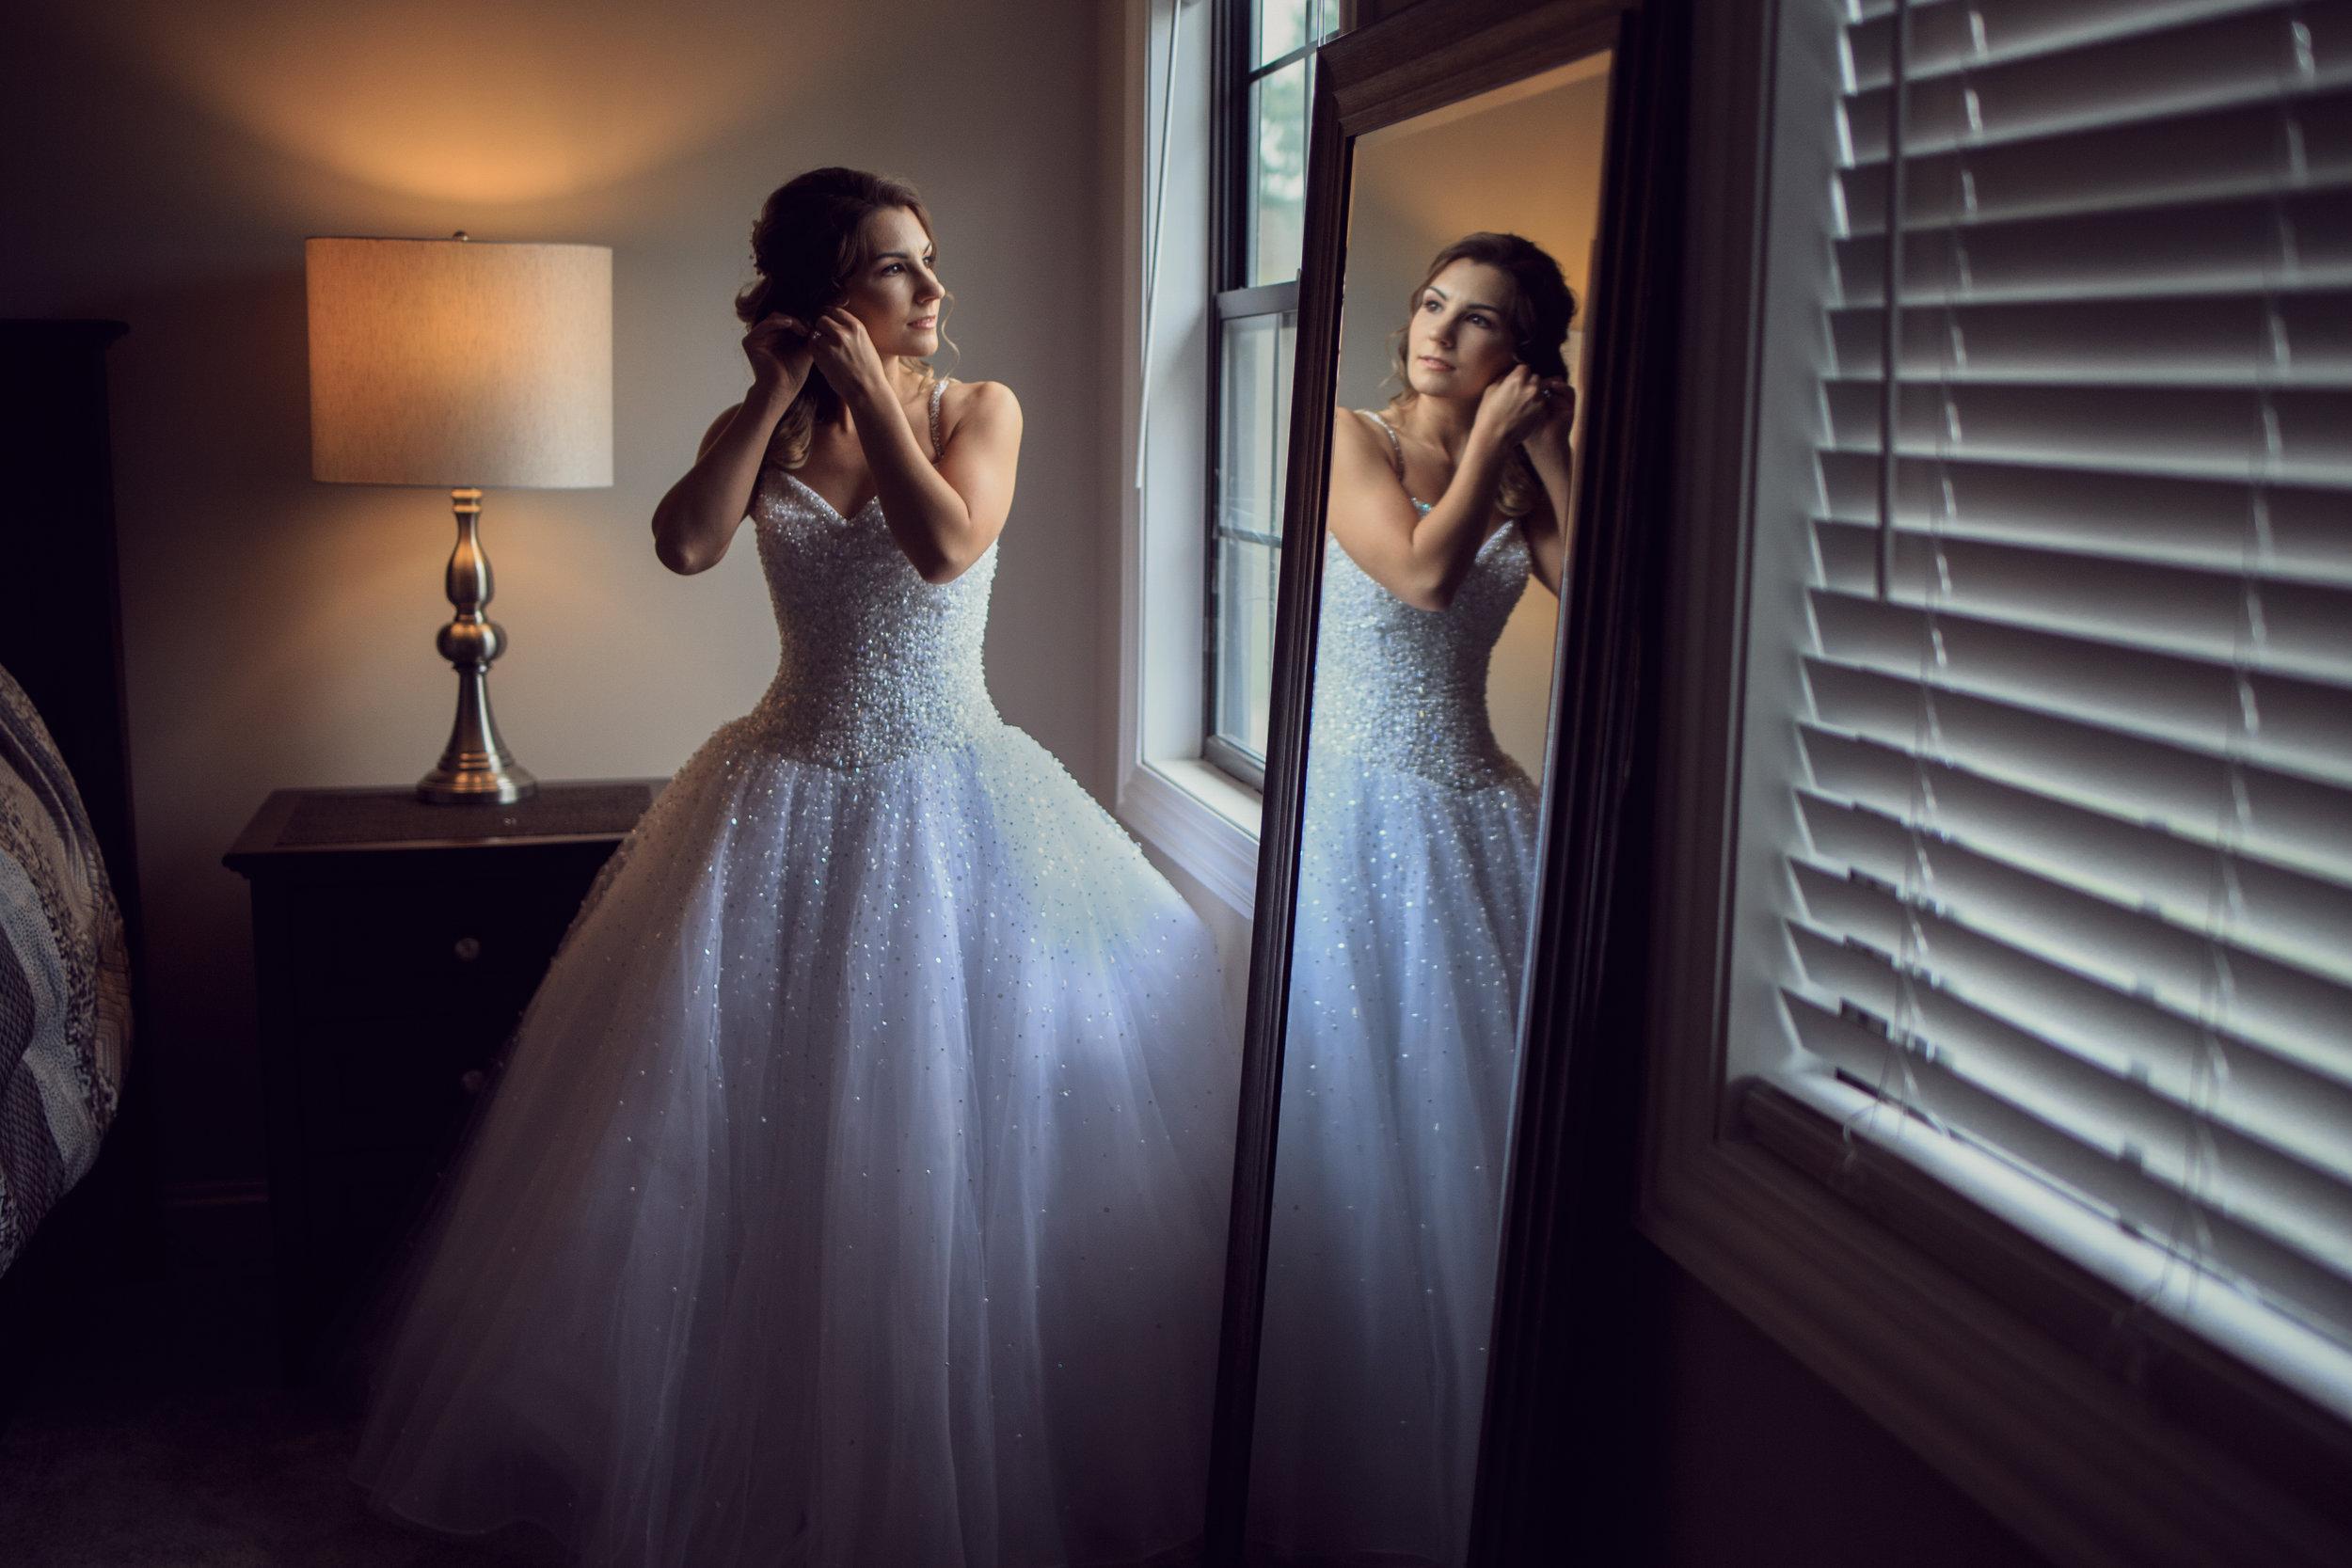 Wedding-couple-takes-photos-at-lowes-hardware-due-to-rain44.jpg